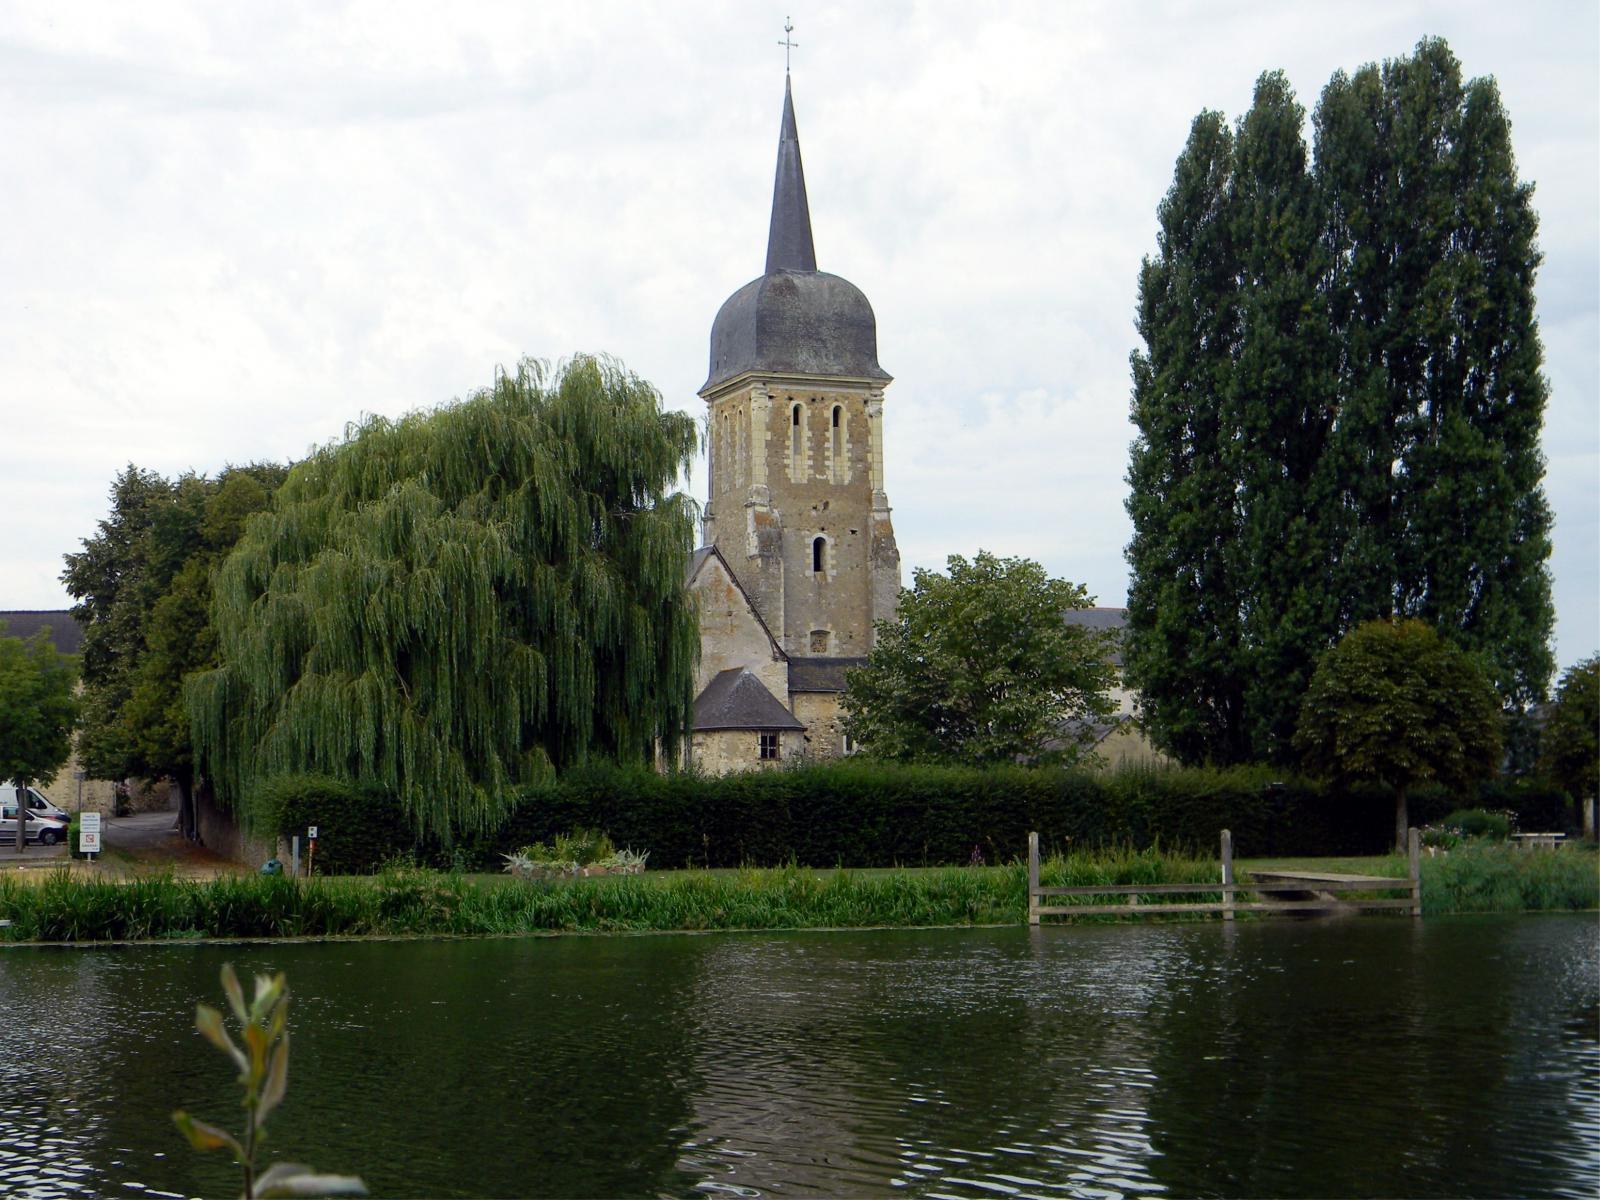 Eglise de Brissarthe